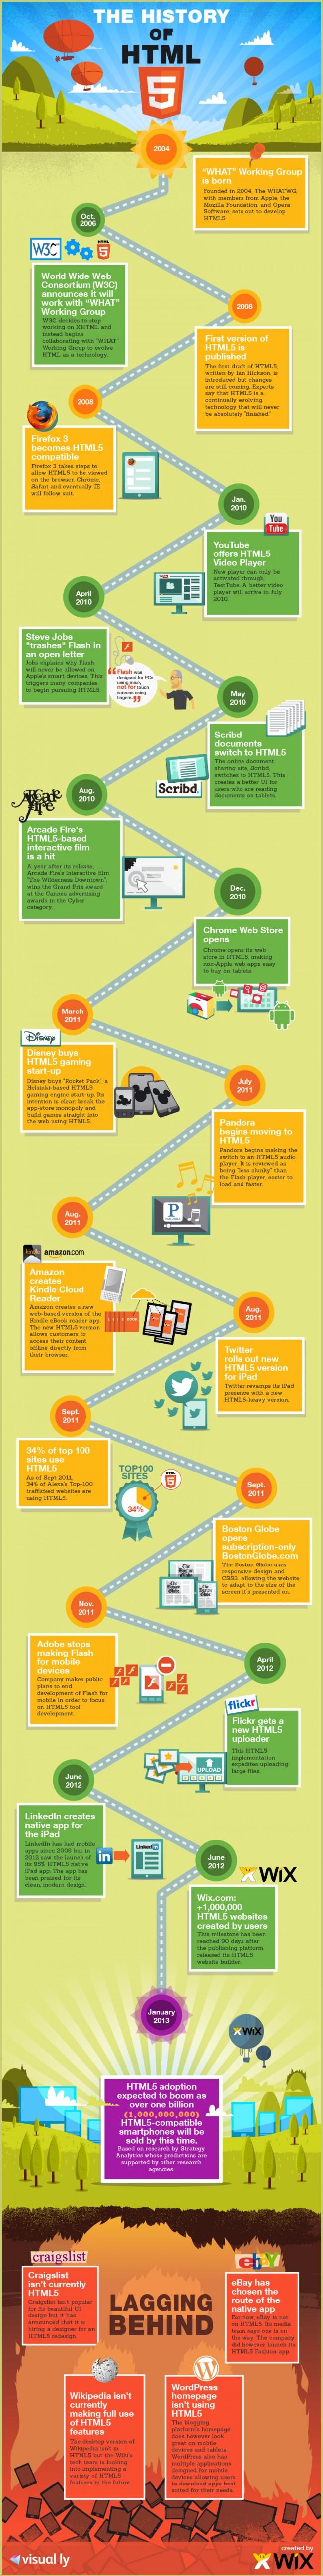 infografia historia de html5